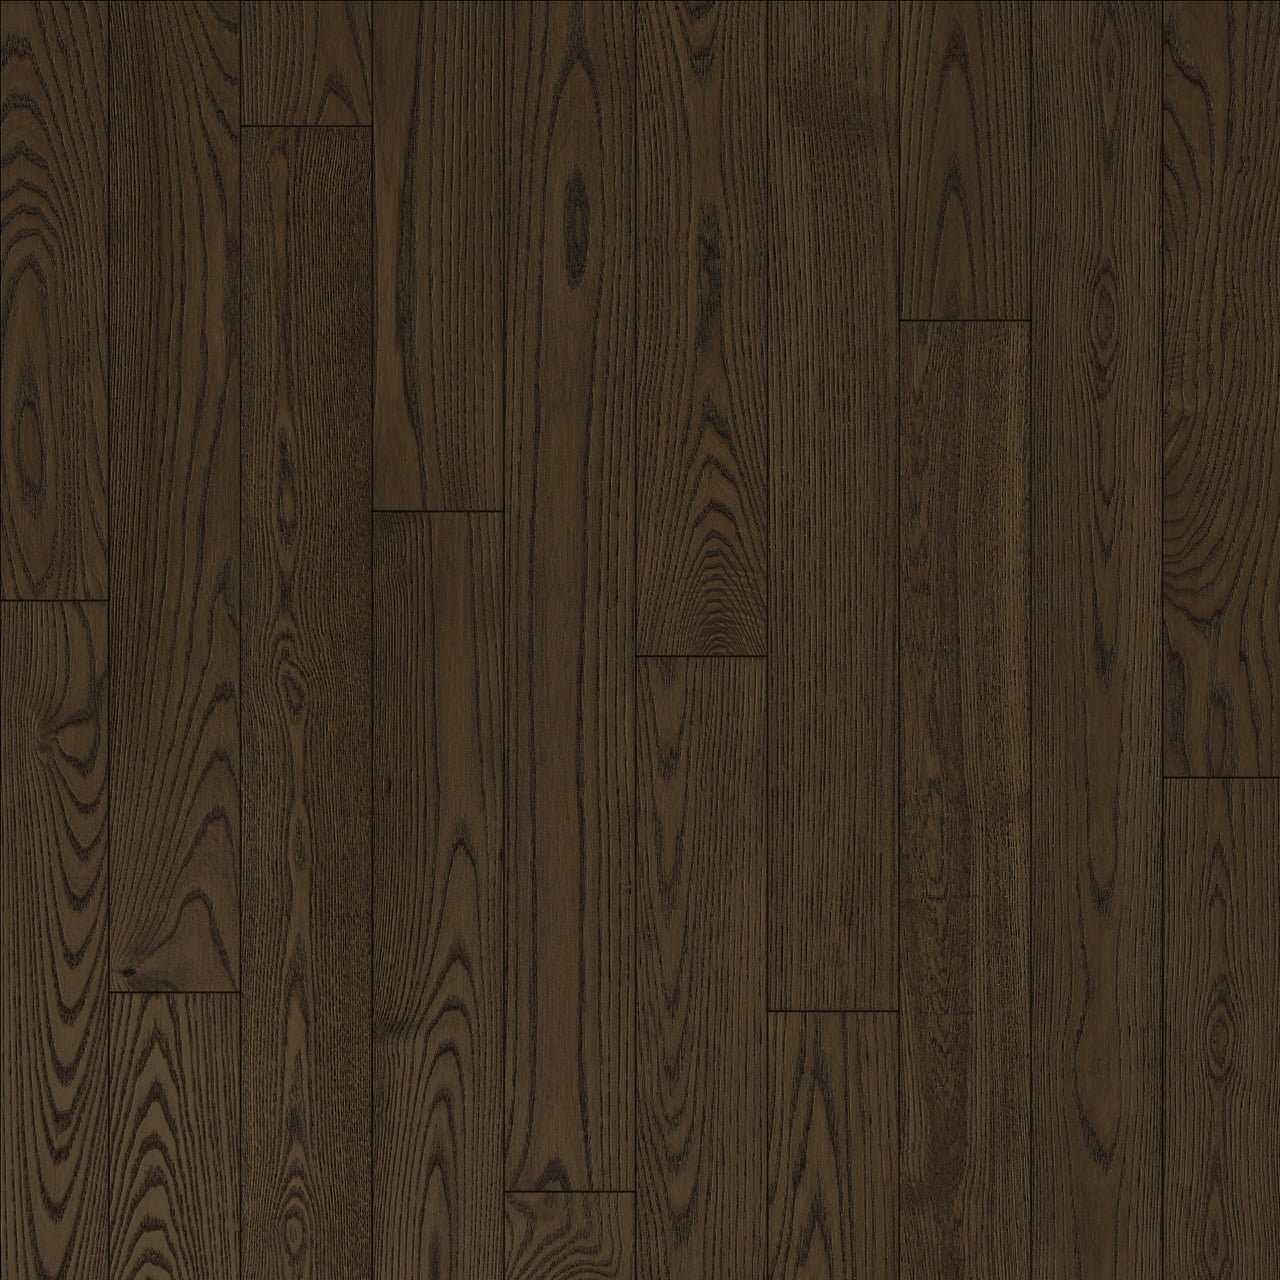 Preverco Ash Distinction Brushed Mambo Aa Floors Amp More Ltd